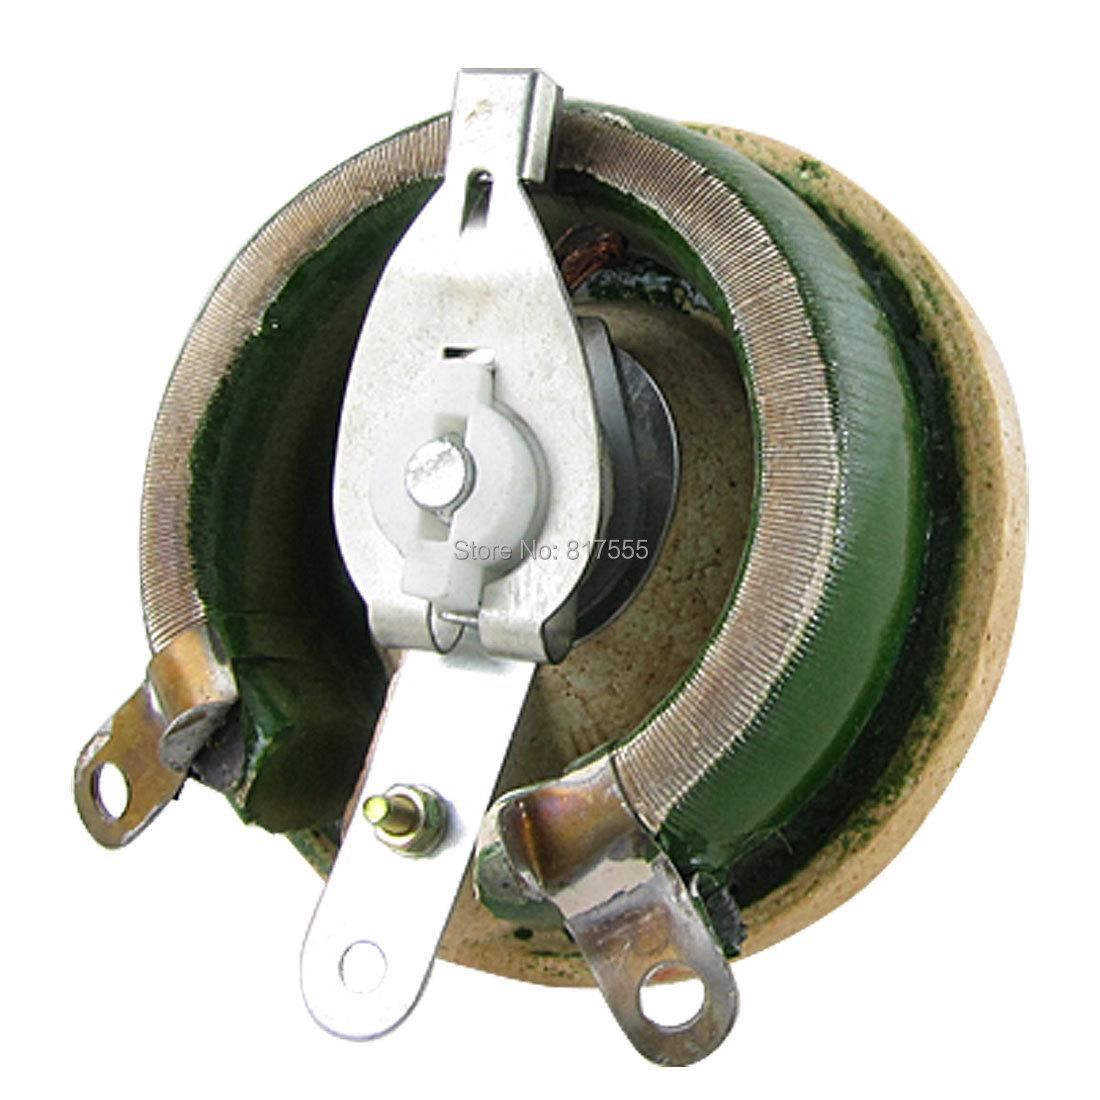 Wirewound Ceramic Potentiometer Variable Rheostat Resistor 25W 500 Ohm